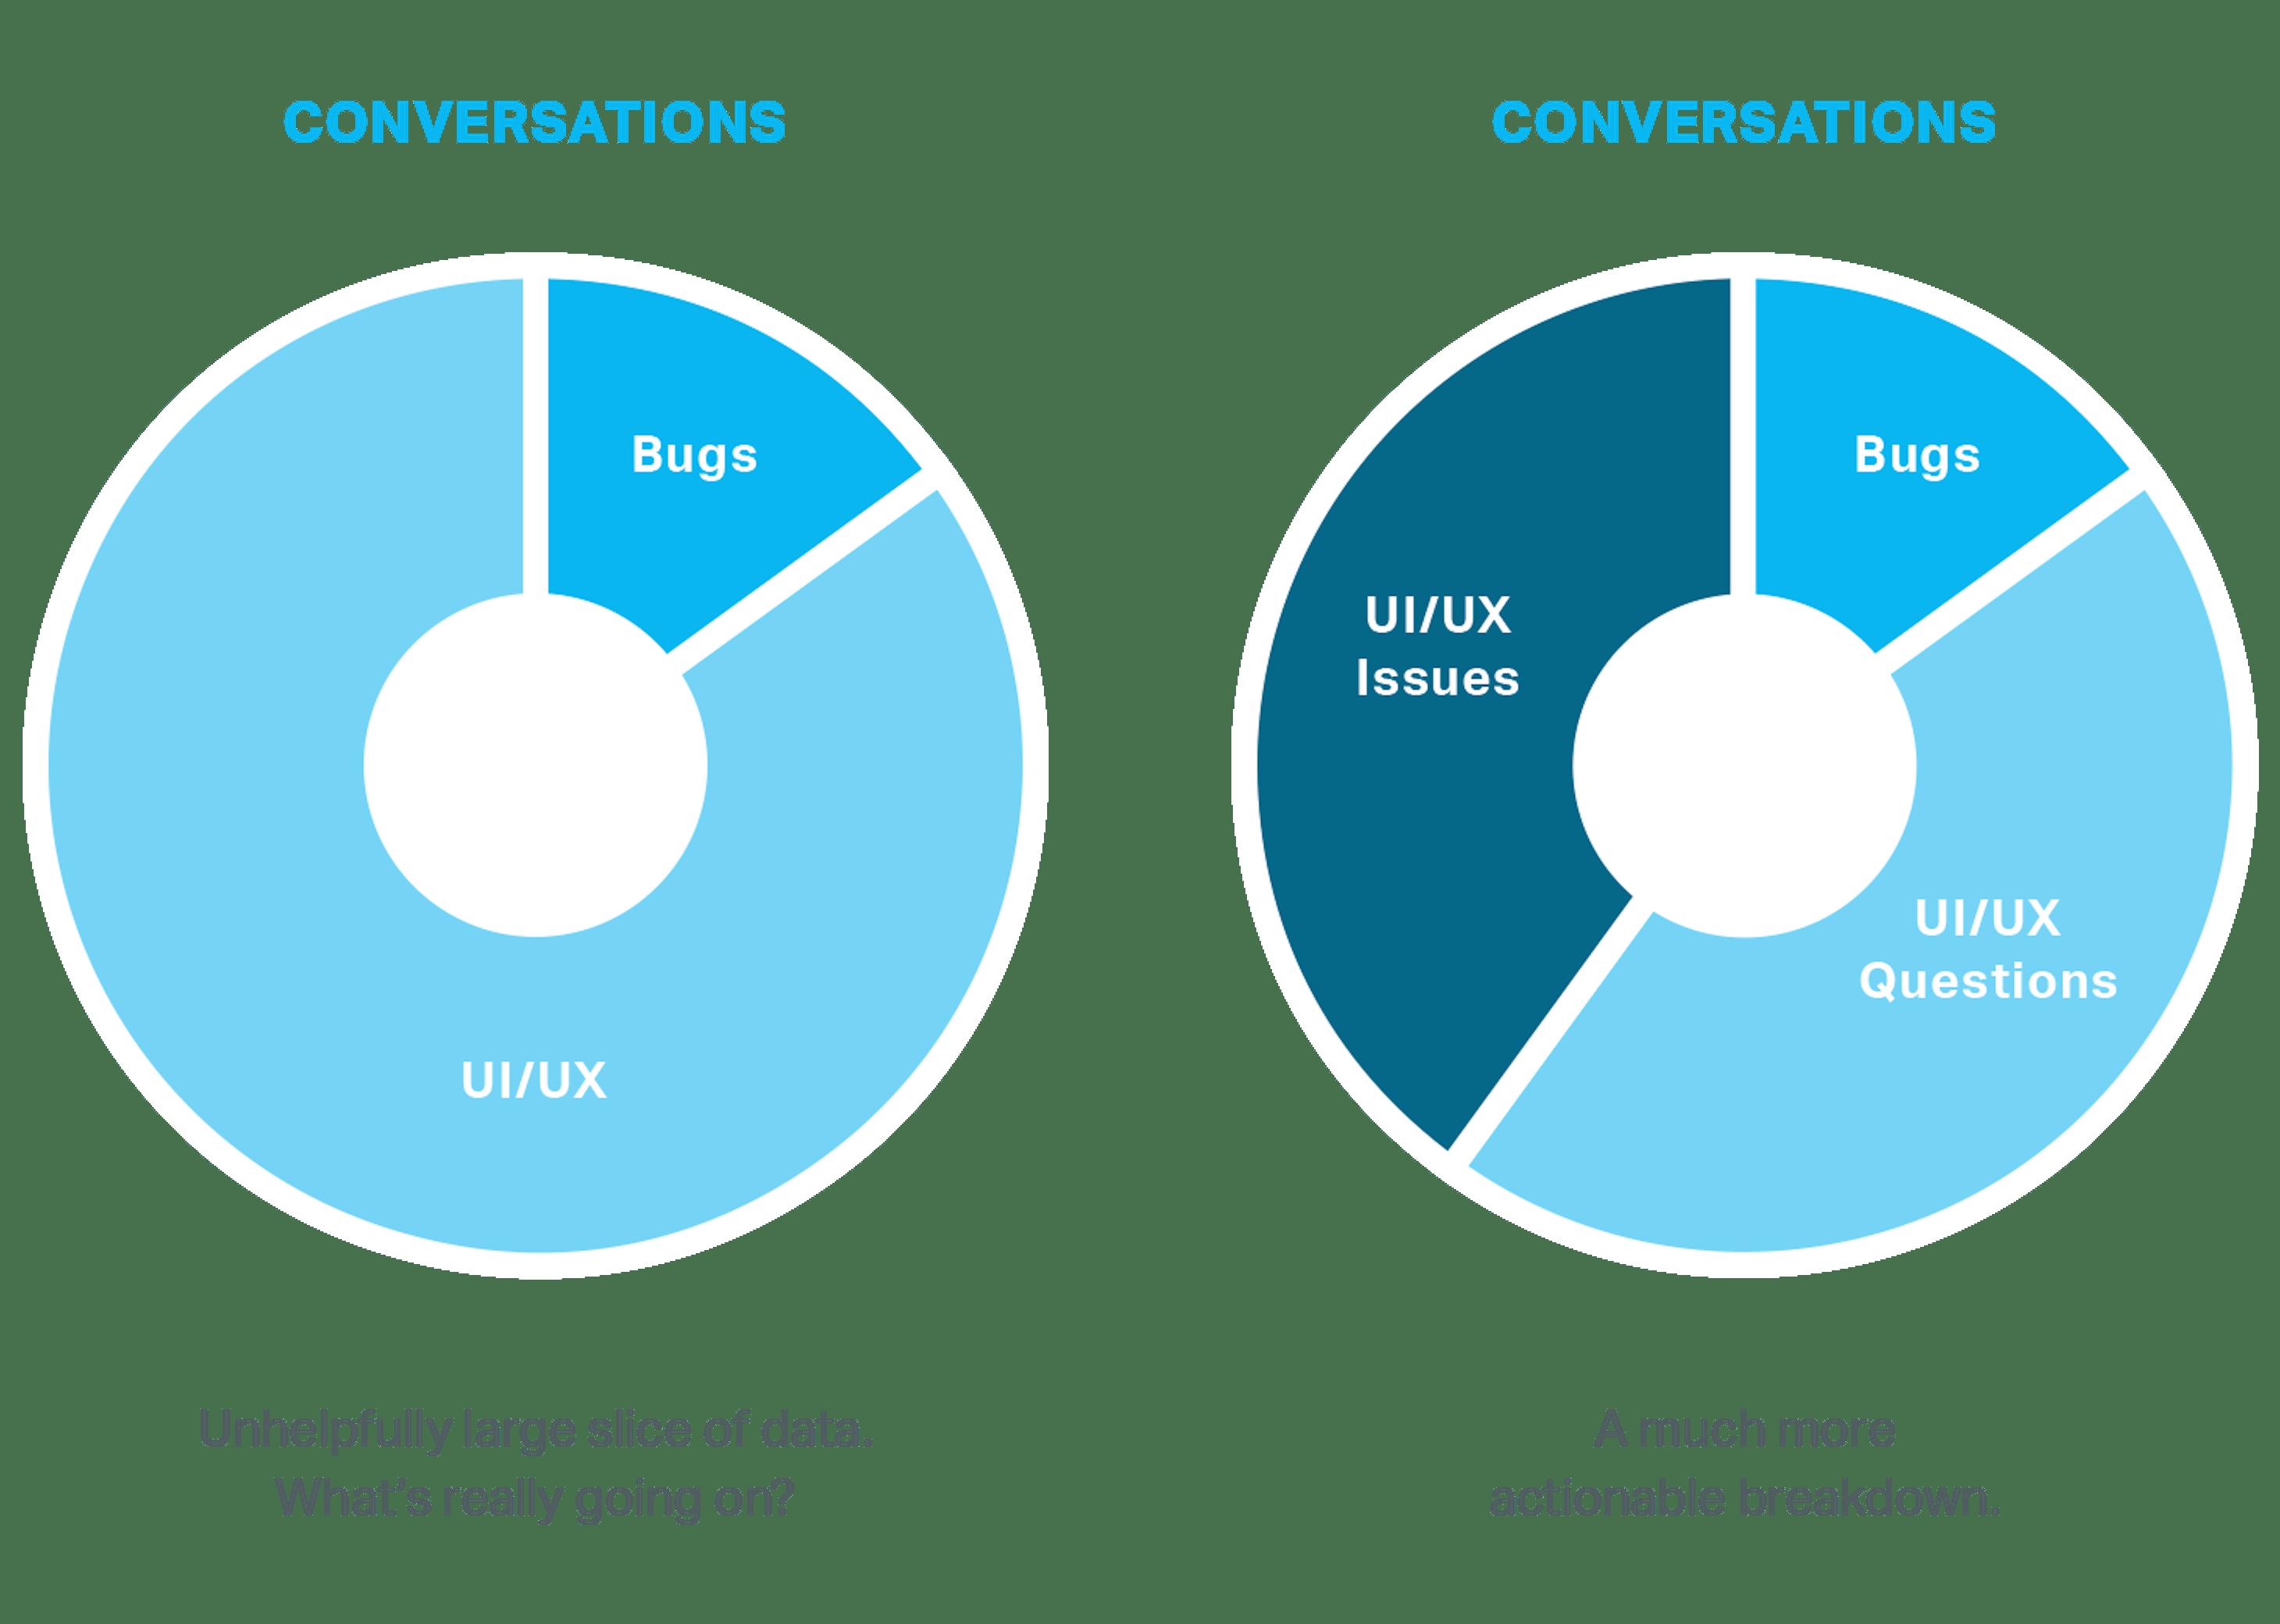 Conversation data comparision